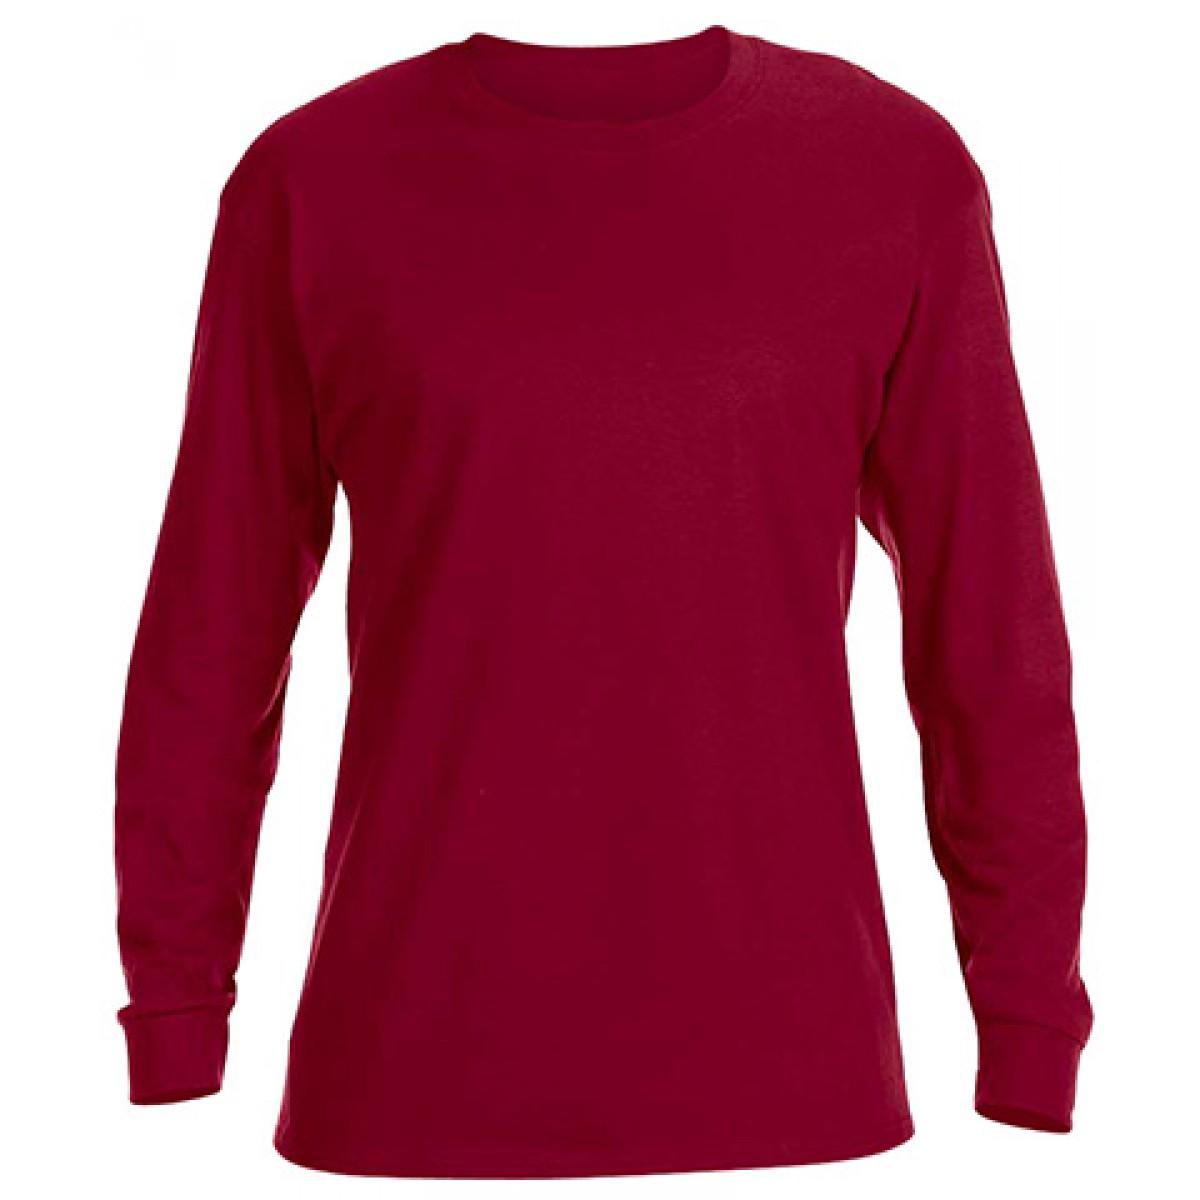 Basic Long Sleeve Crew Neck -Cardinal Red-YM